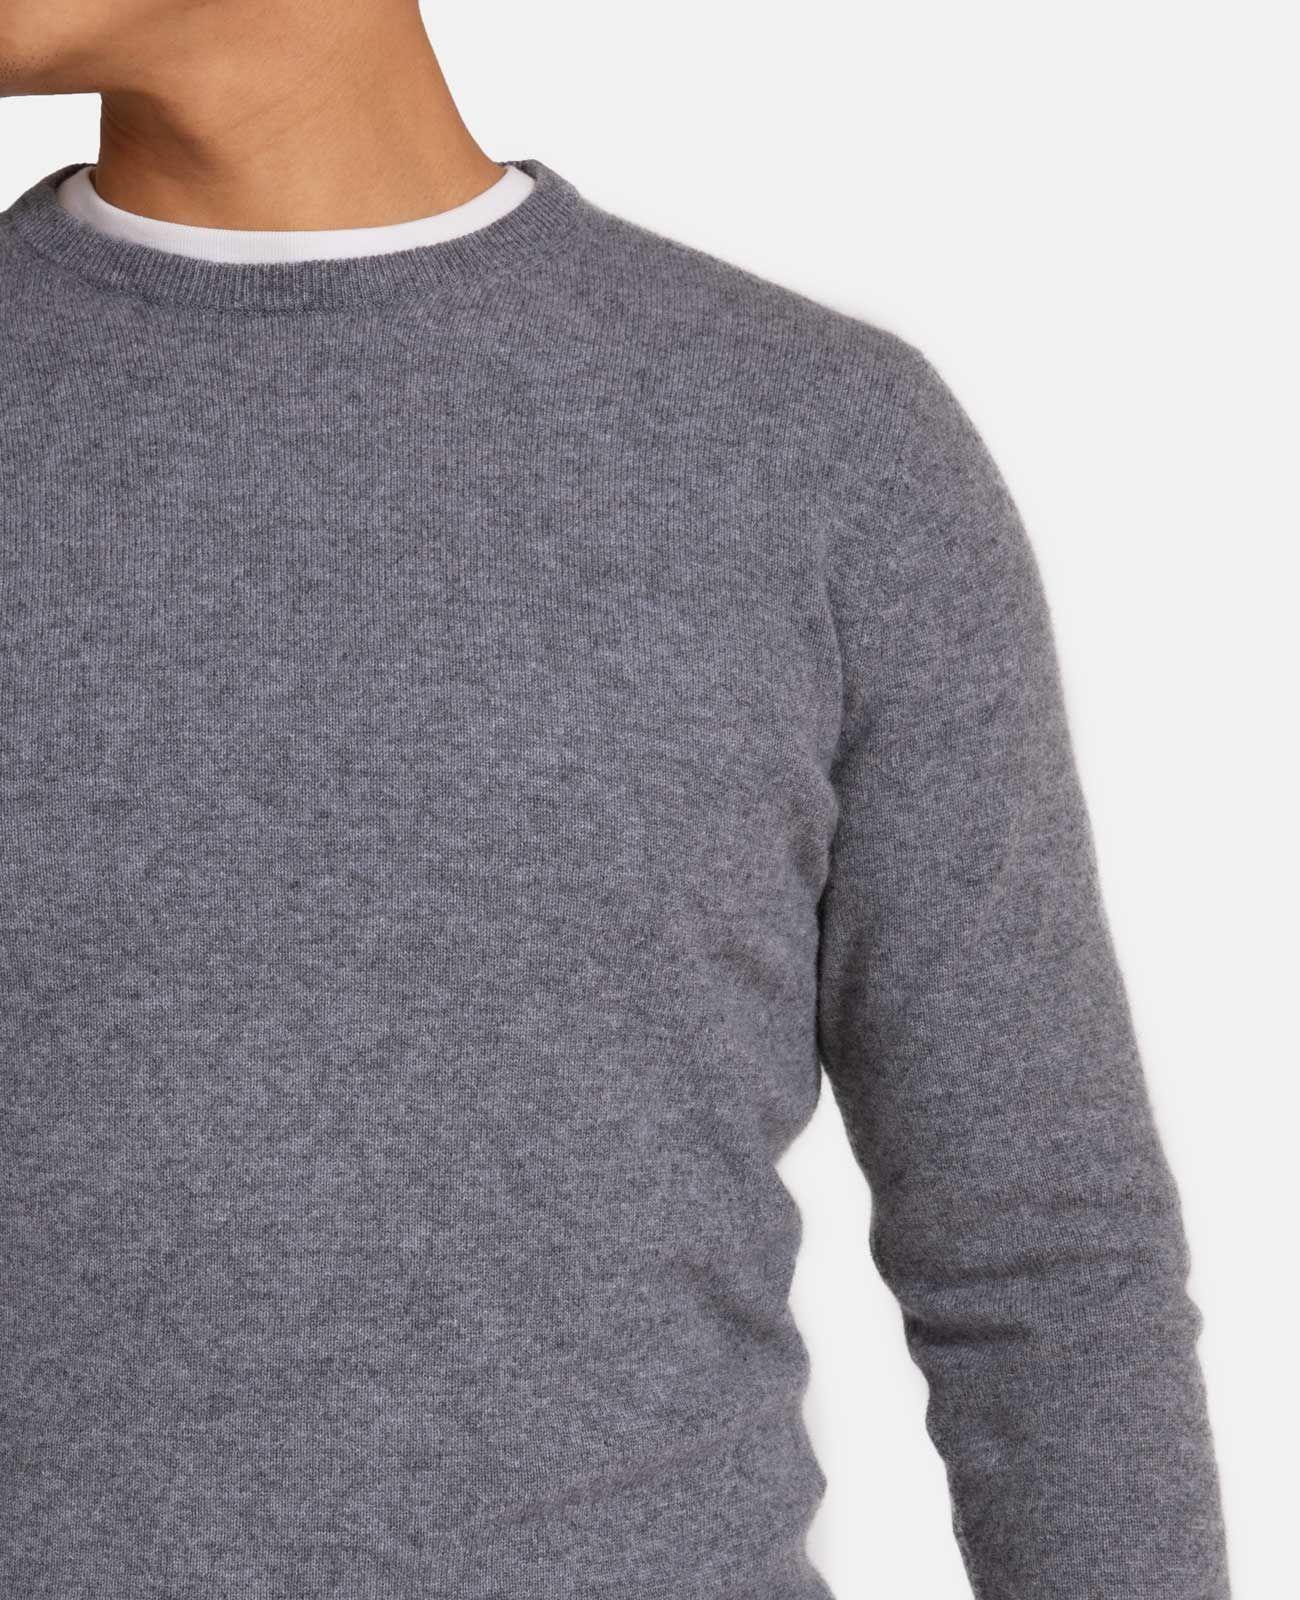 ccff8470 Mongolian Cashmere Crew Neck Sweater | Grana